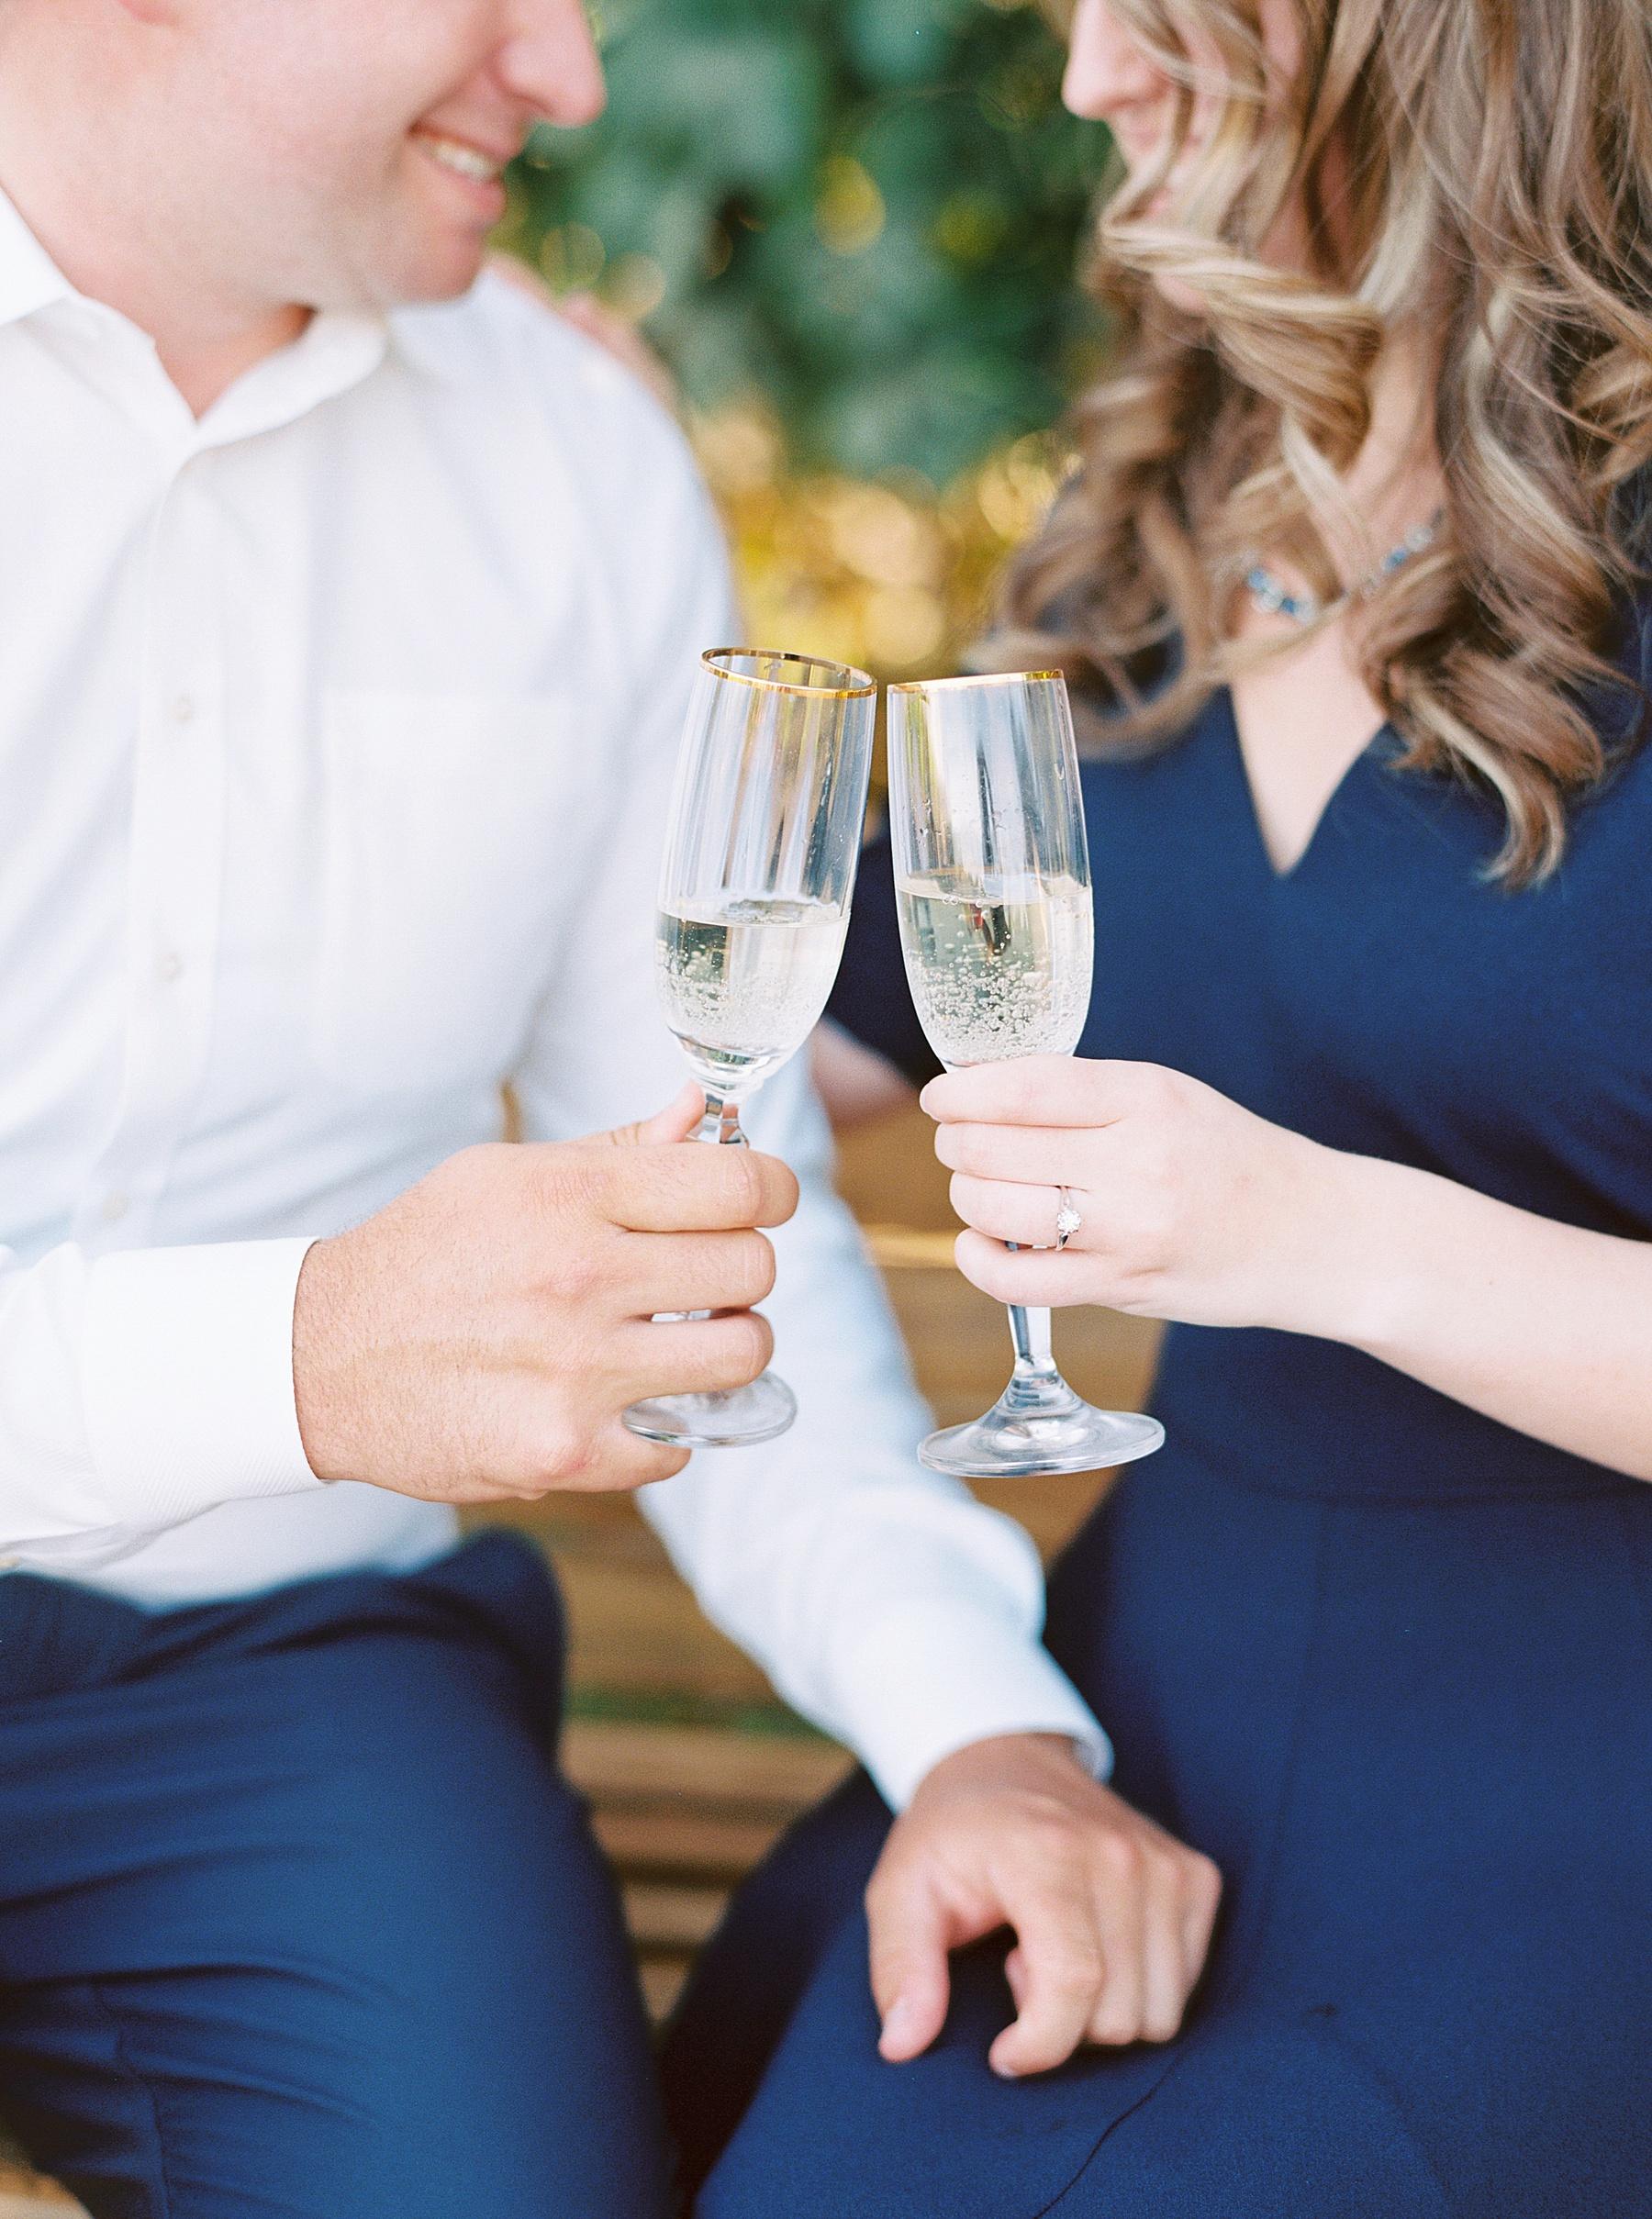 Scribner Bend Winery Engagement Session - Courtney and Steven - Ashley Baumgartner - Sribner Bend Wedding Photographer - Sacramento Wedding Photographer_0003.jpg